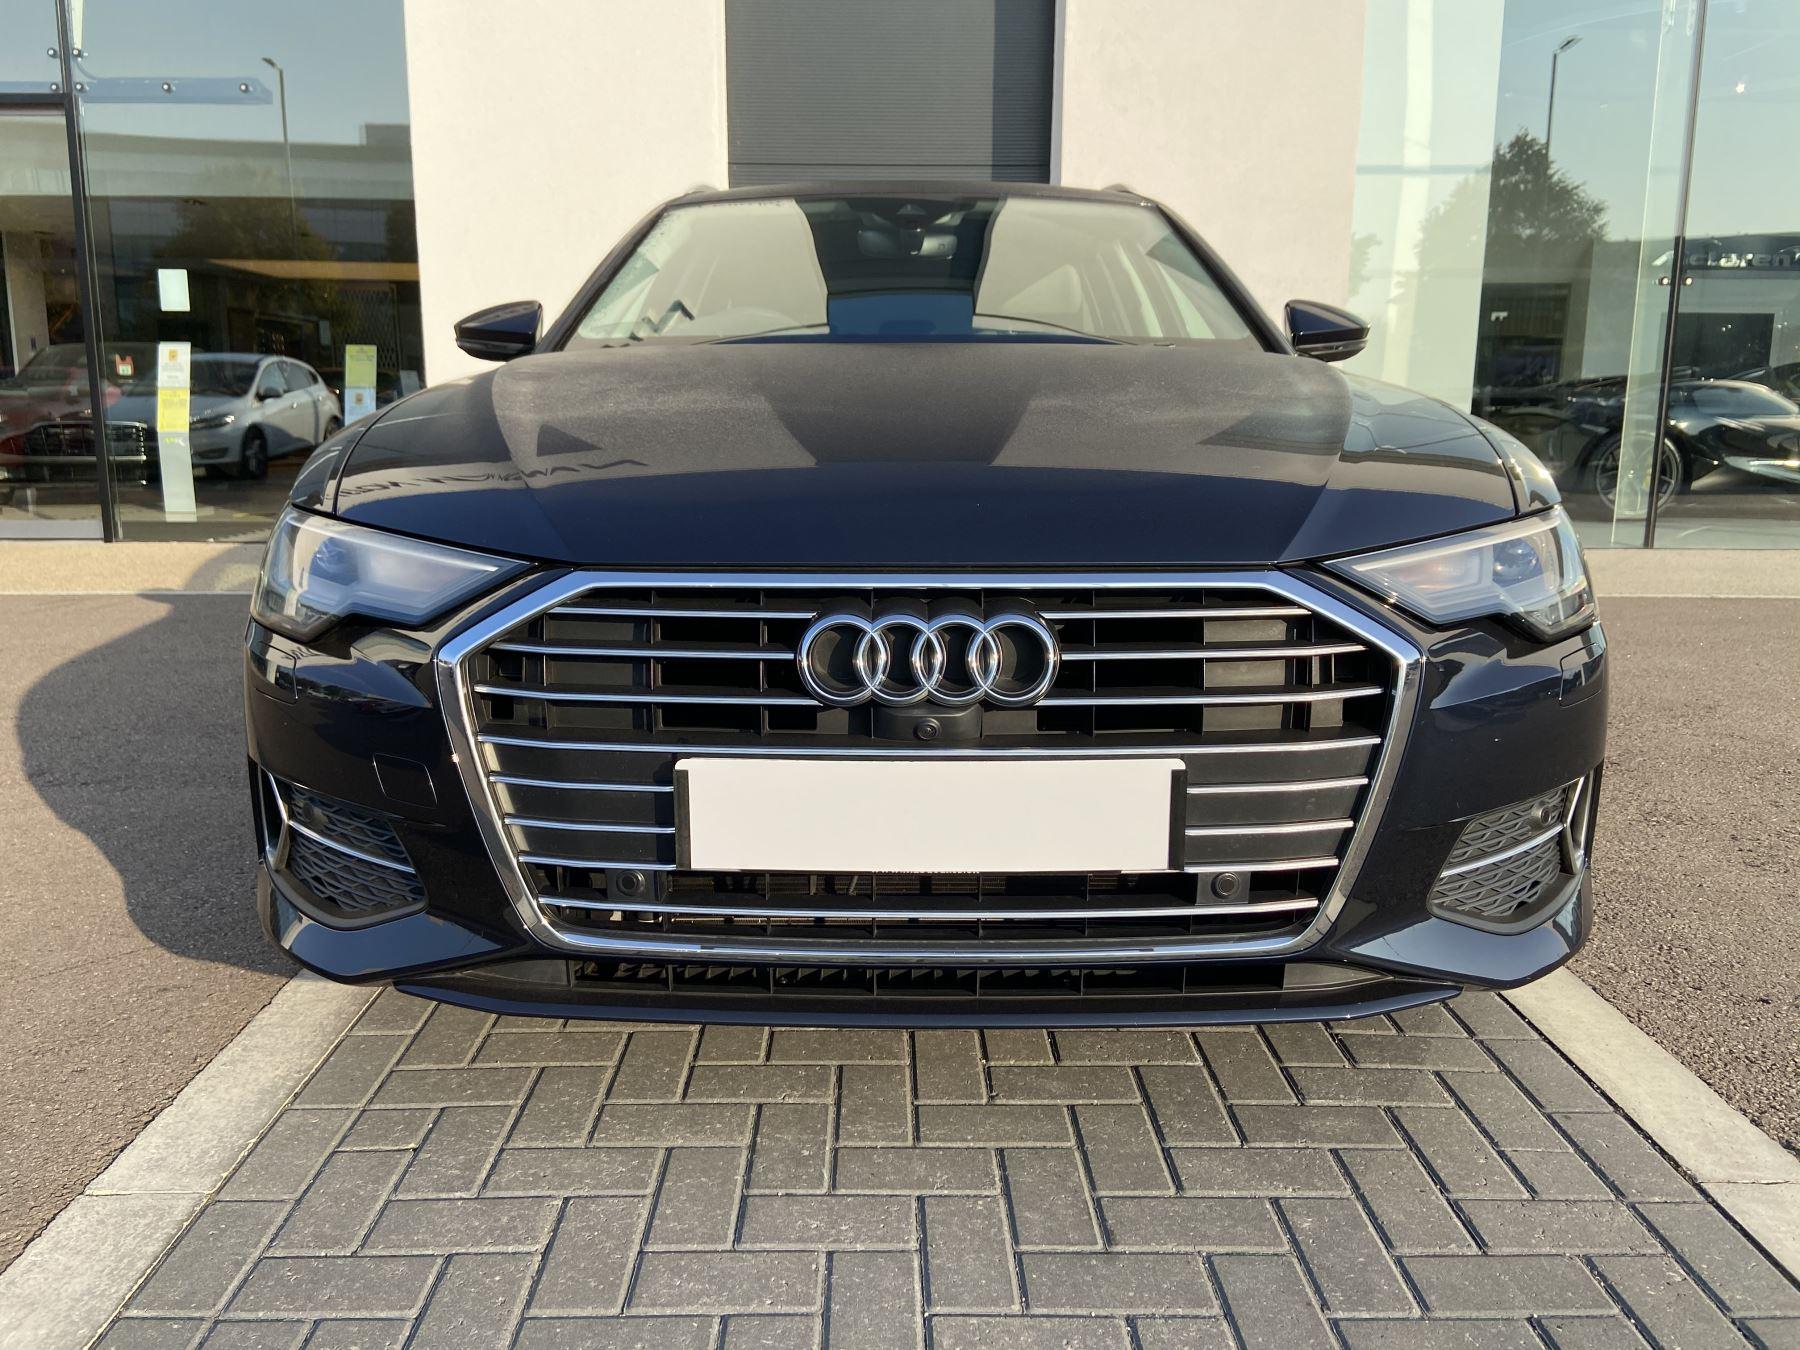 Audi A6 40 TDI Sport 5dr S Tronic 2.0 Diesel Automatic Estate (2019)